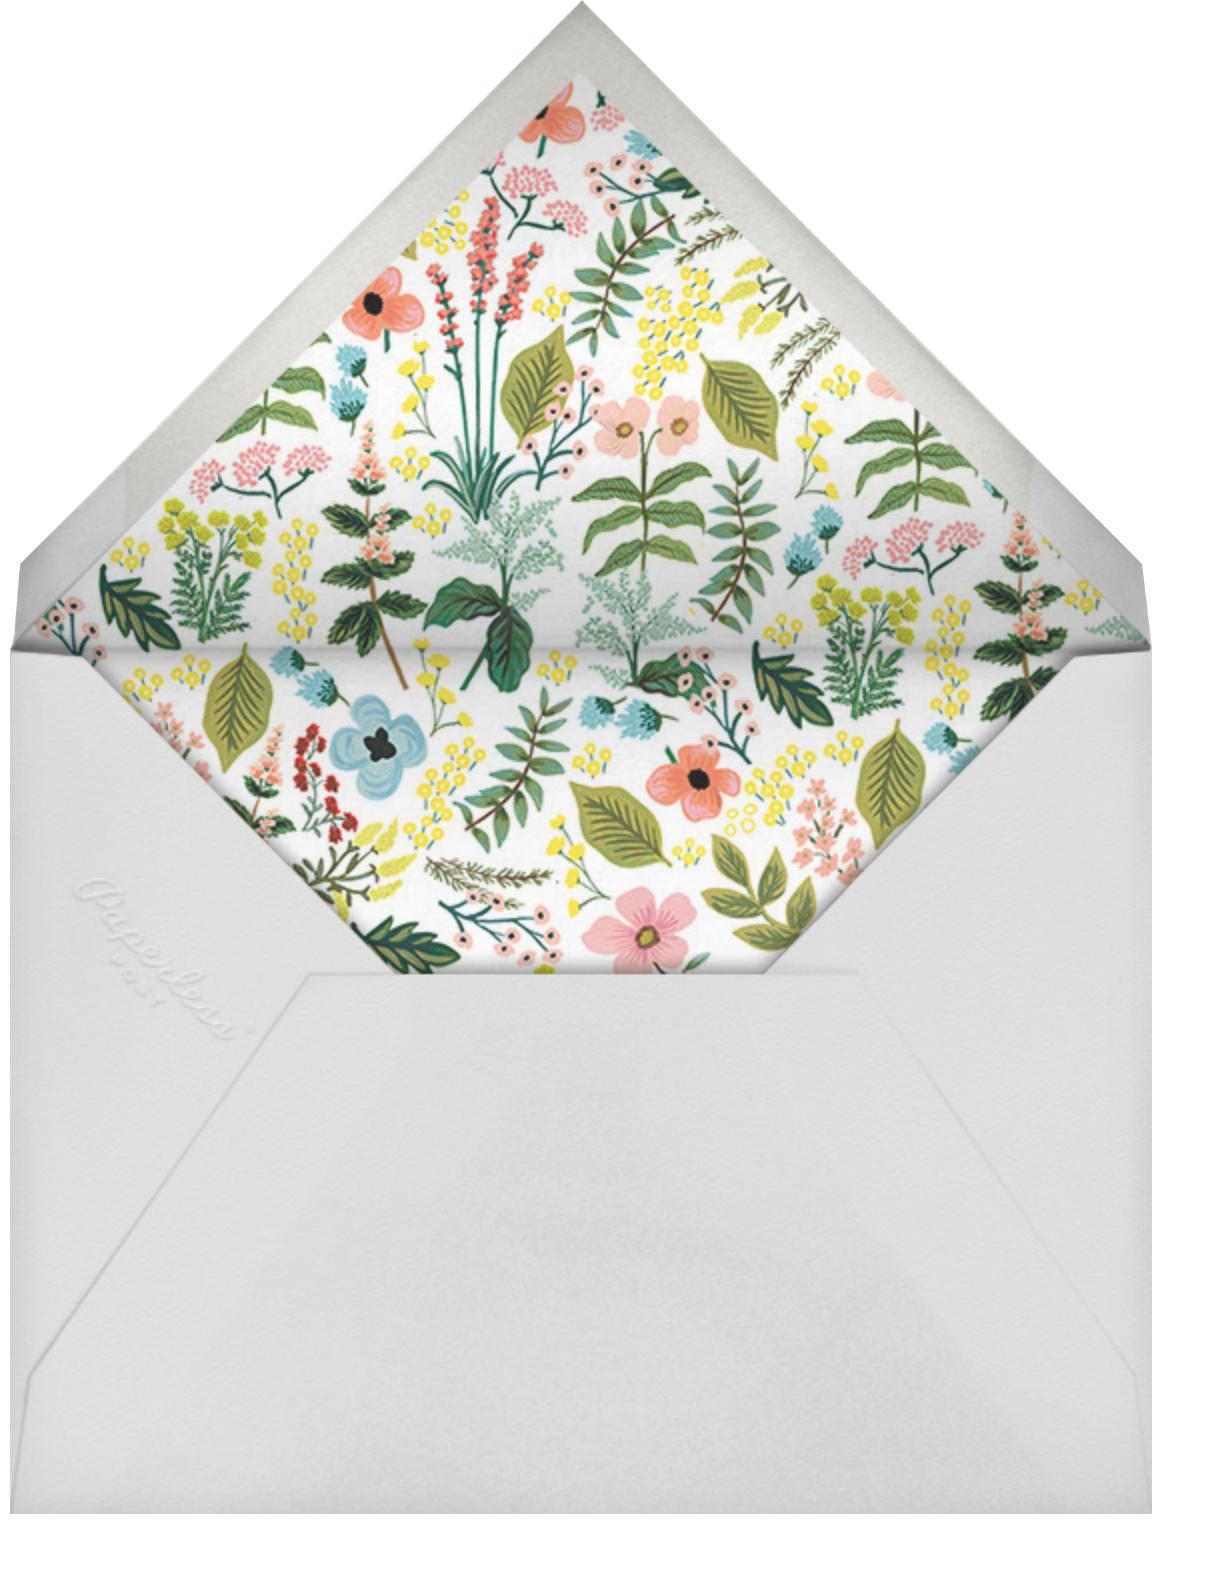 Spring Gathering - White - Rifle Paper Co. - Adult birthday - envelope back